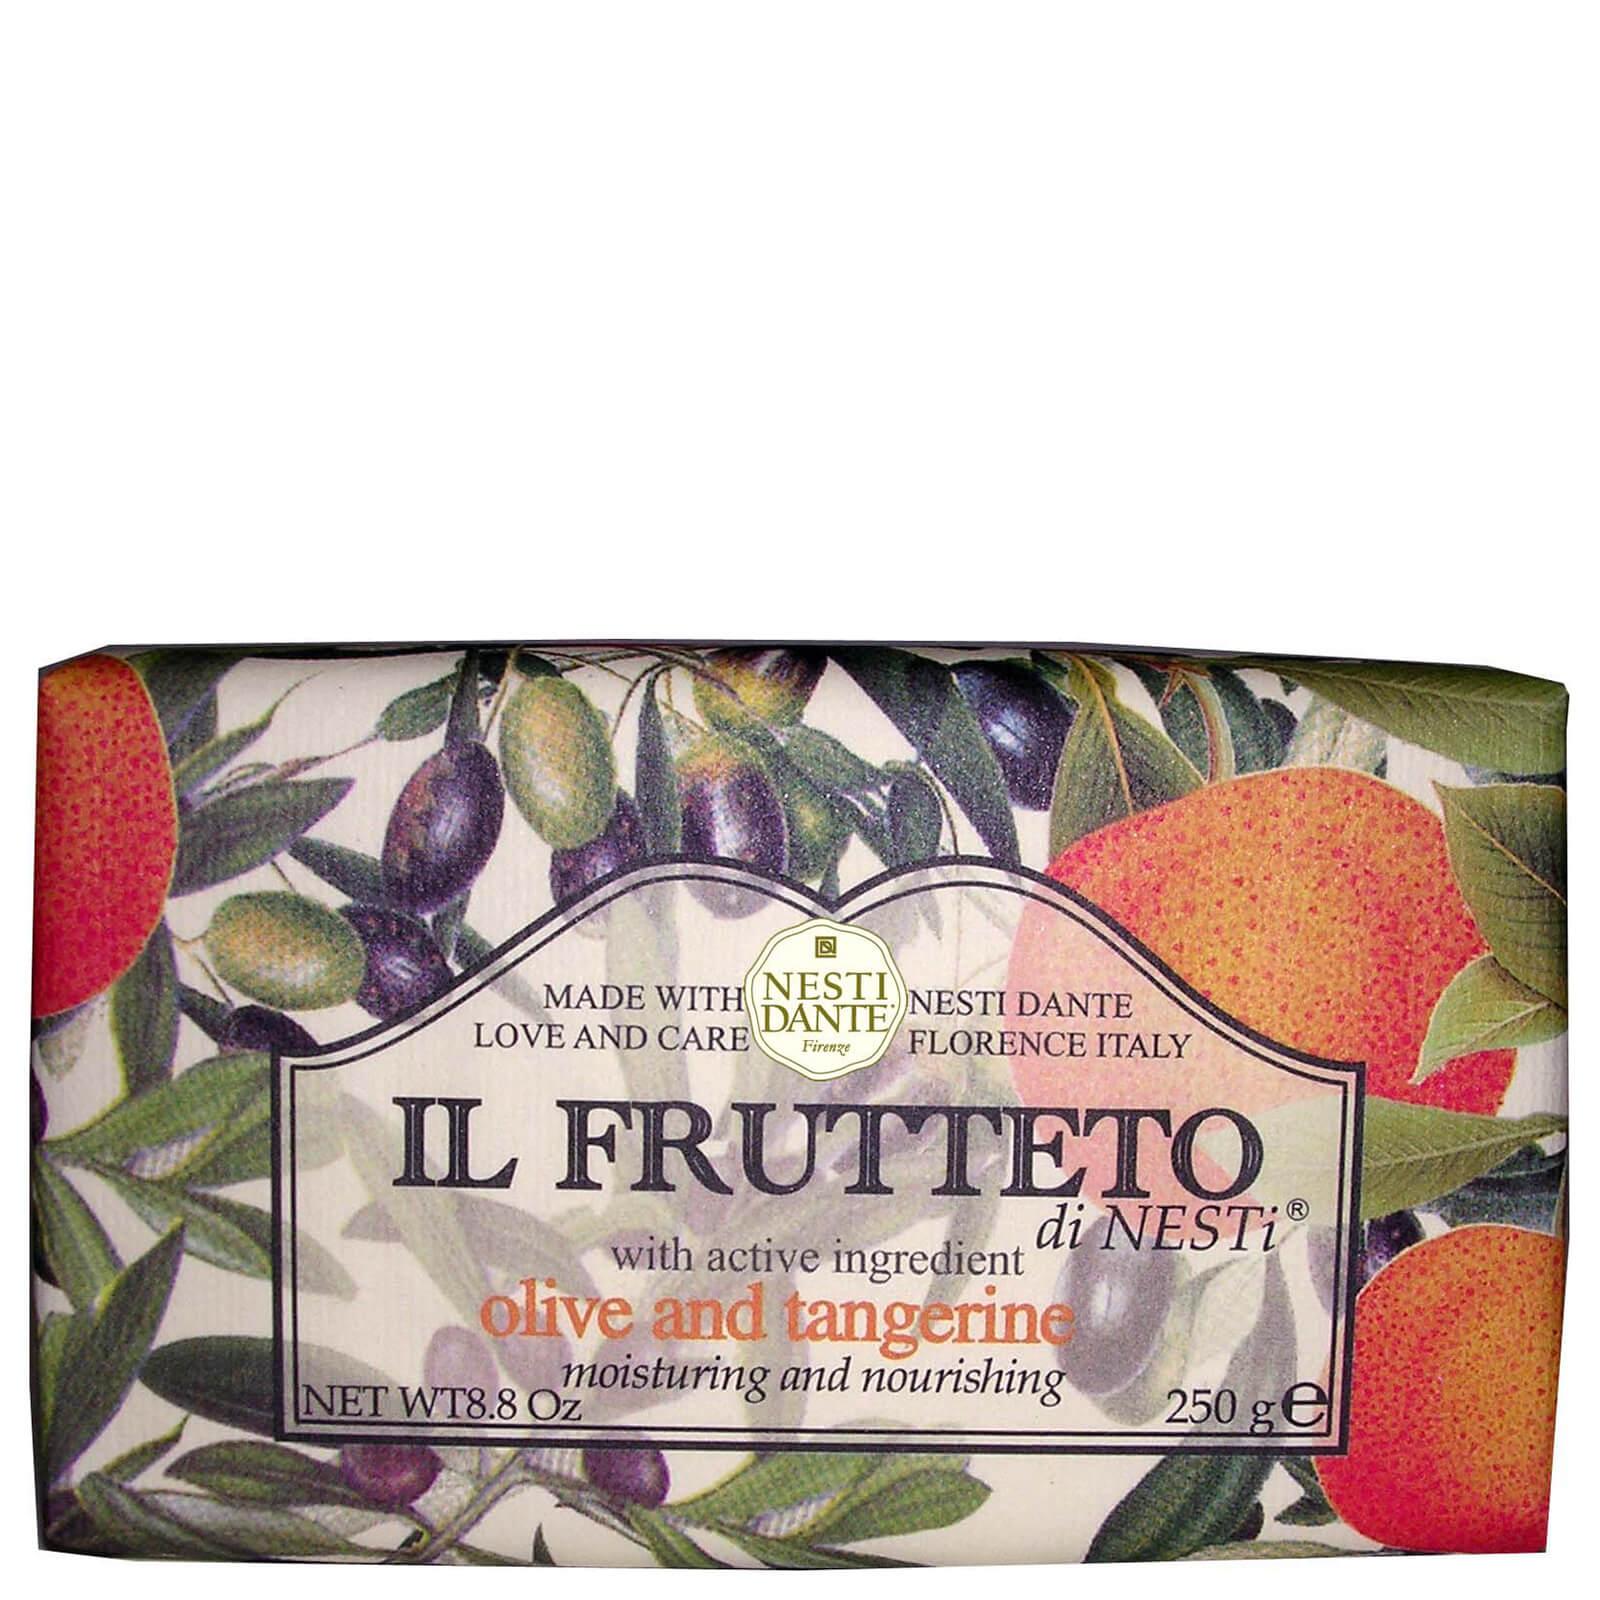 Купить Натуральное мыло «Оливковое масло и мандарин» Nesti Dante Il Frutteto Olive Oil and Tangerine Soap 250г